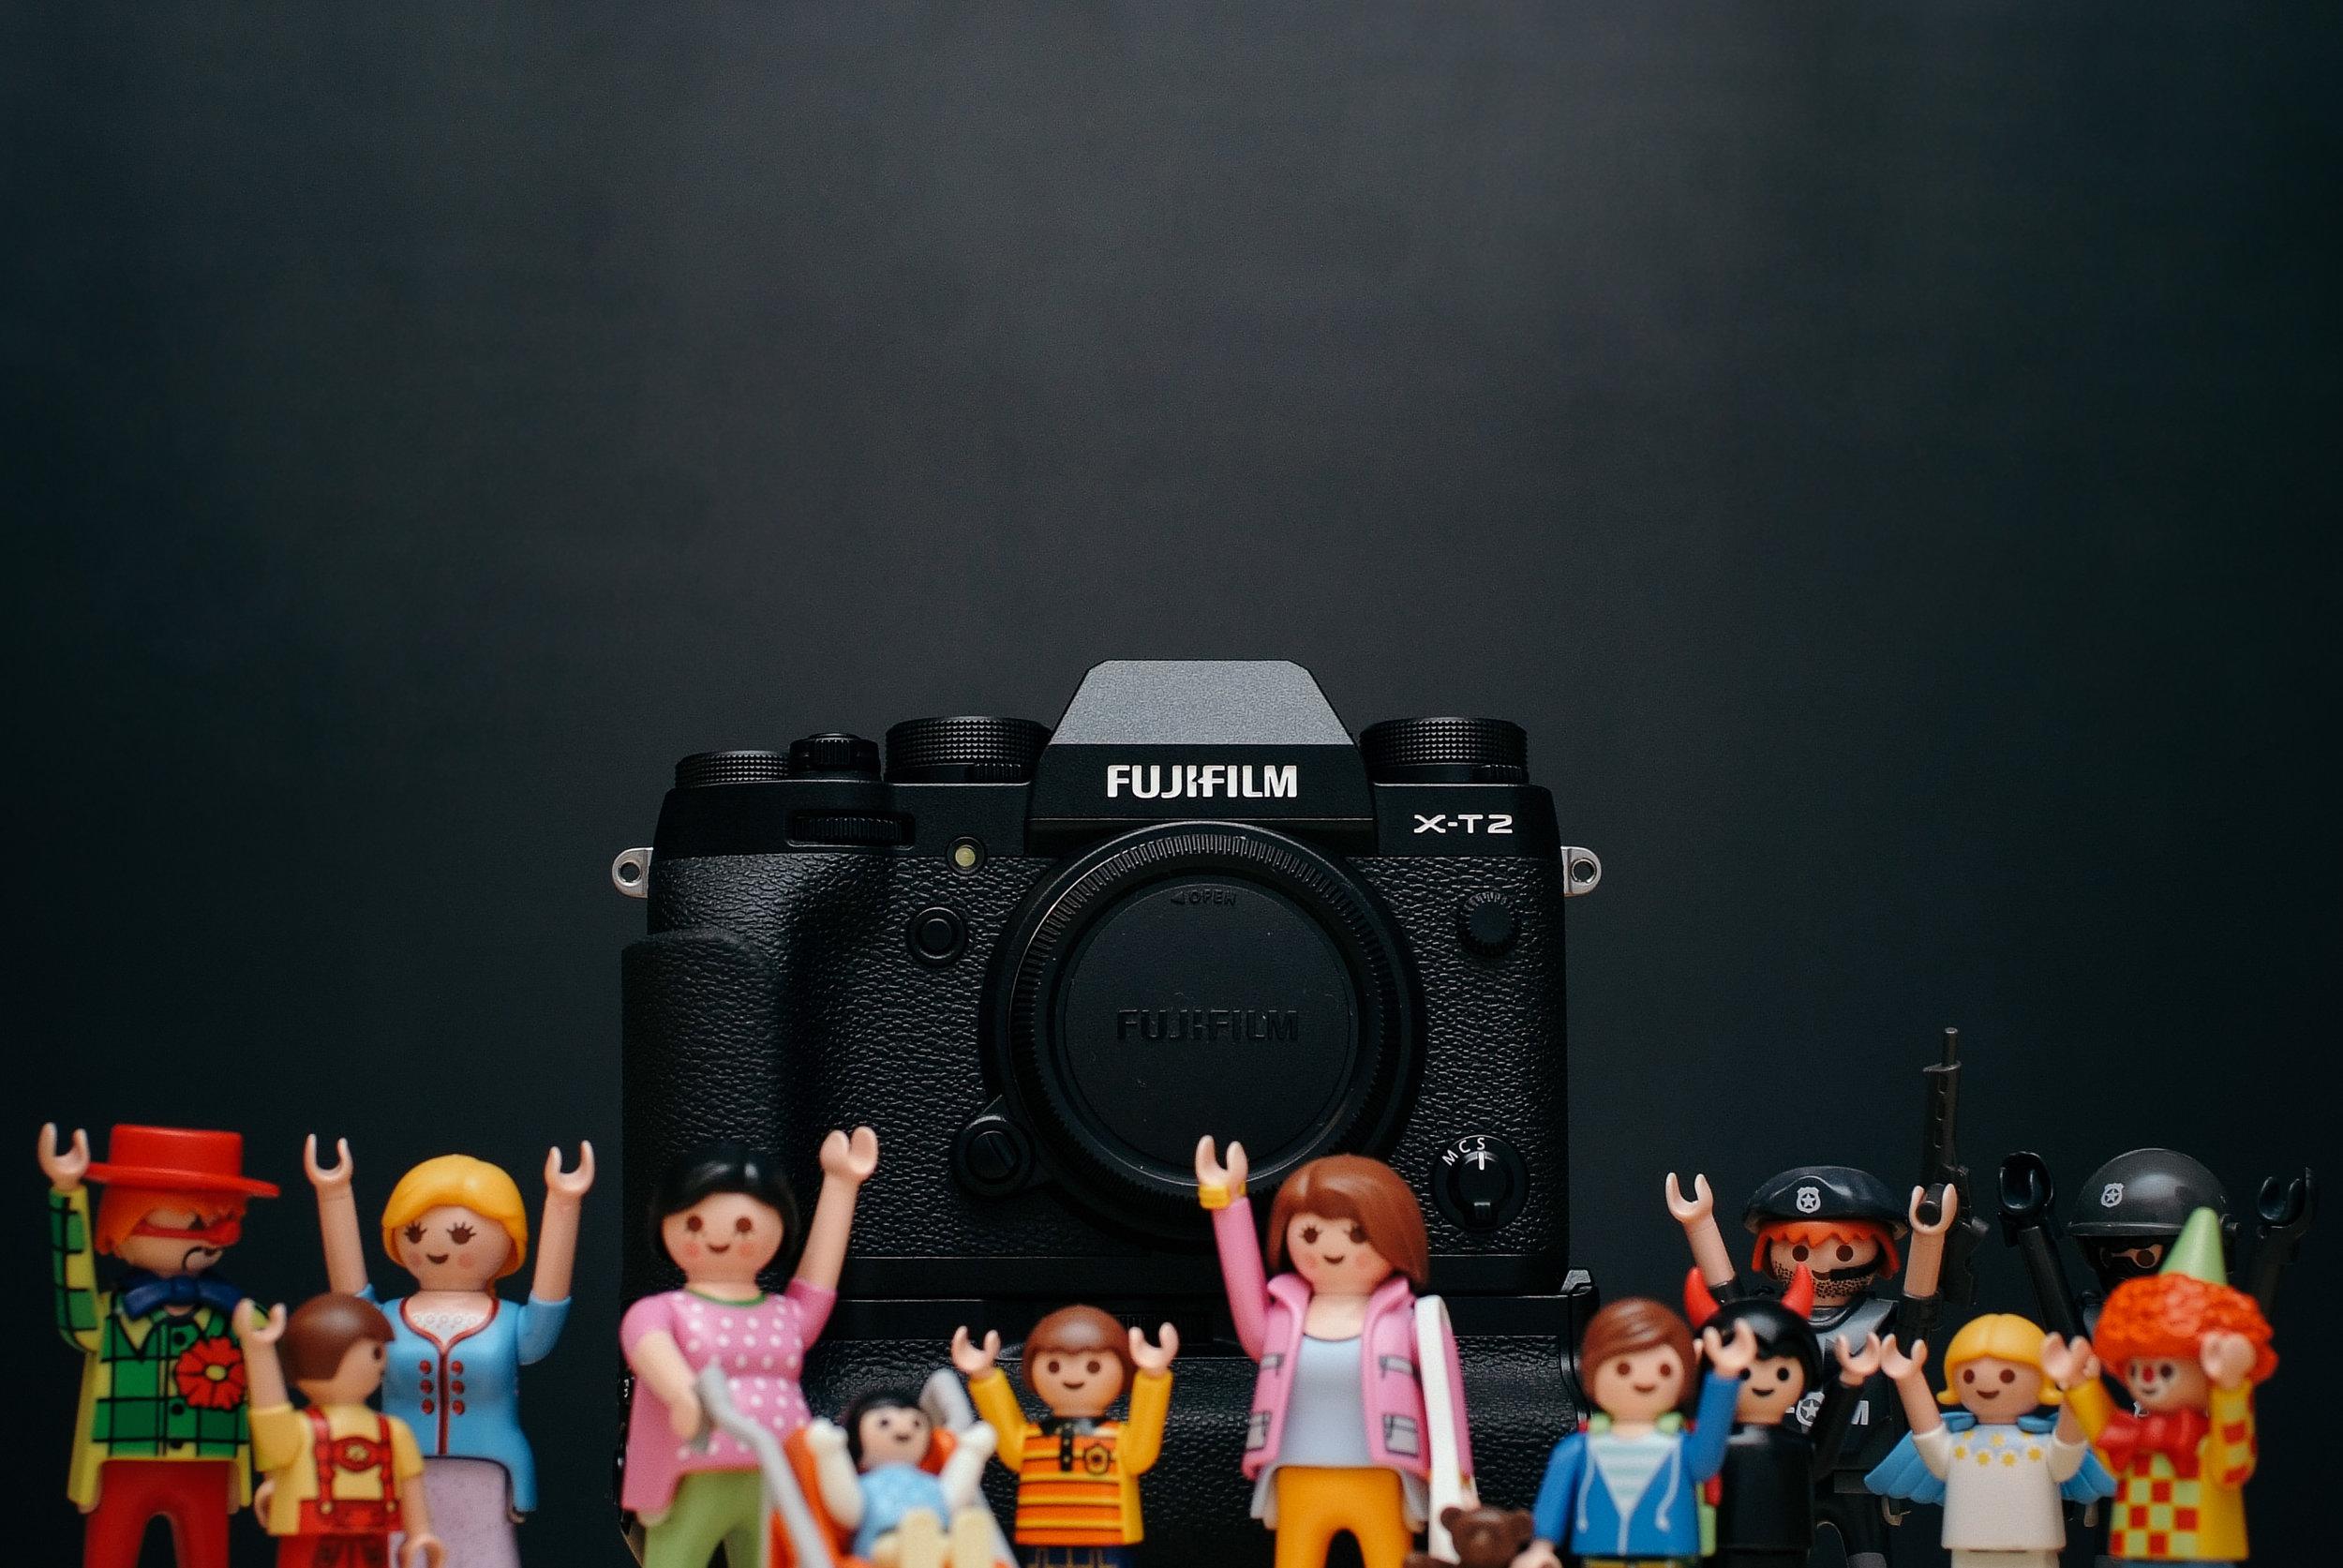 35mm equivalence of native Fujifilm X lenses